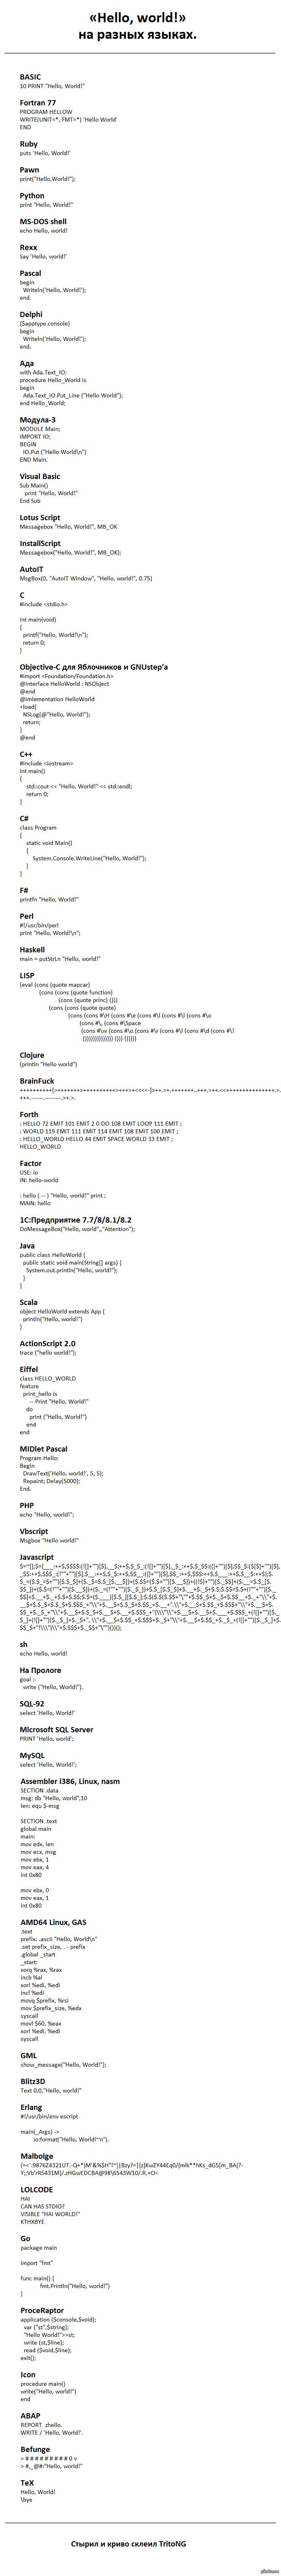 hello world на разных языках программирования